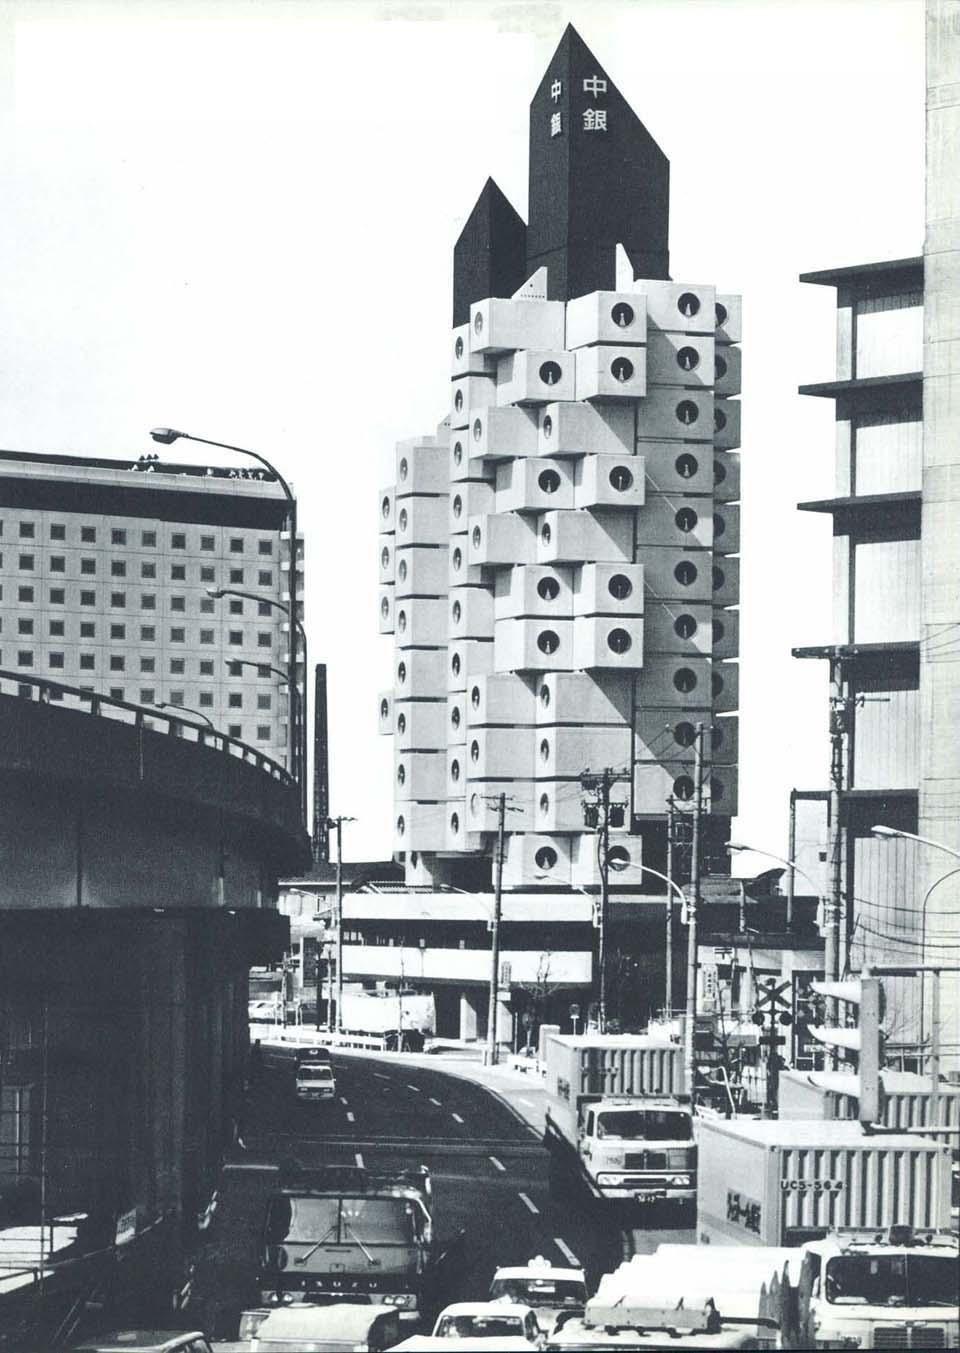 Kurokawa S Capsules Nakagin Capsule Tower Kisho Kurokawa Tower